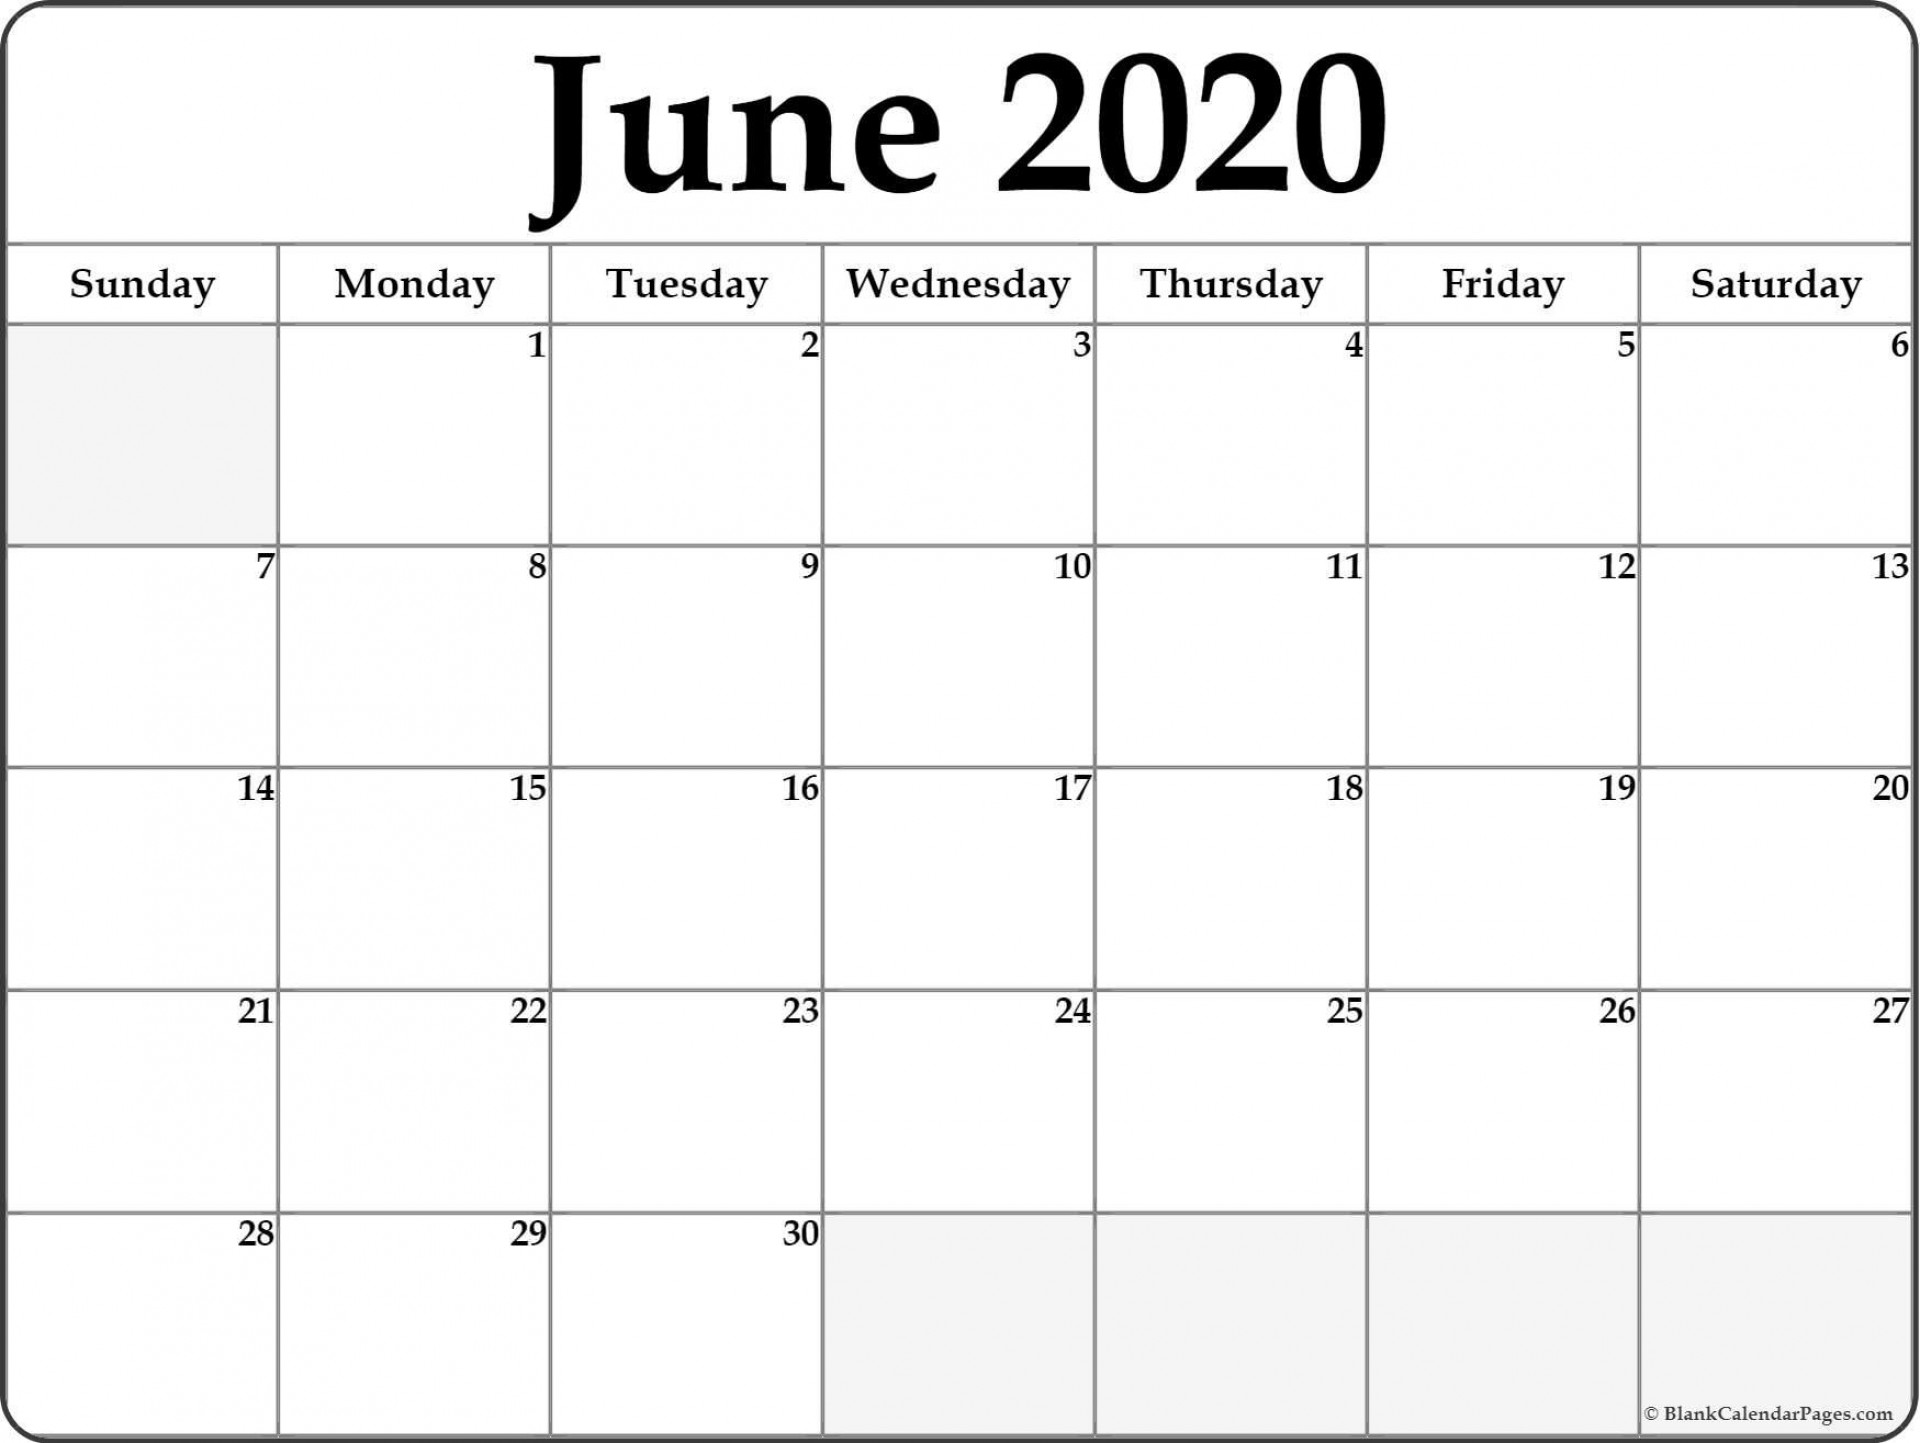 007 Marvelou Printable Calendar Template June 2020 High Resolution  Free1920